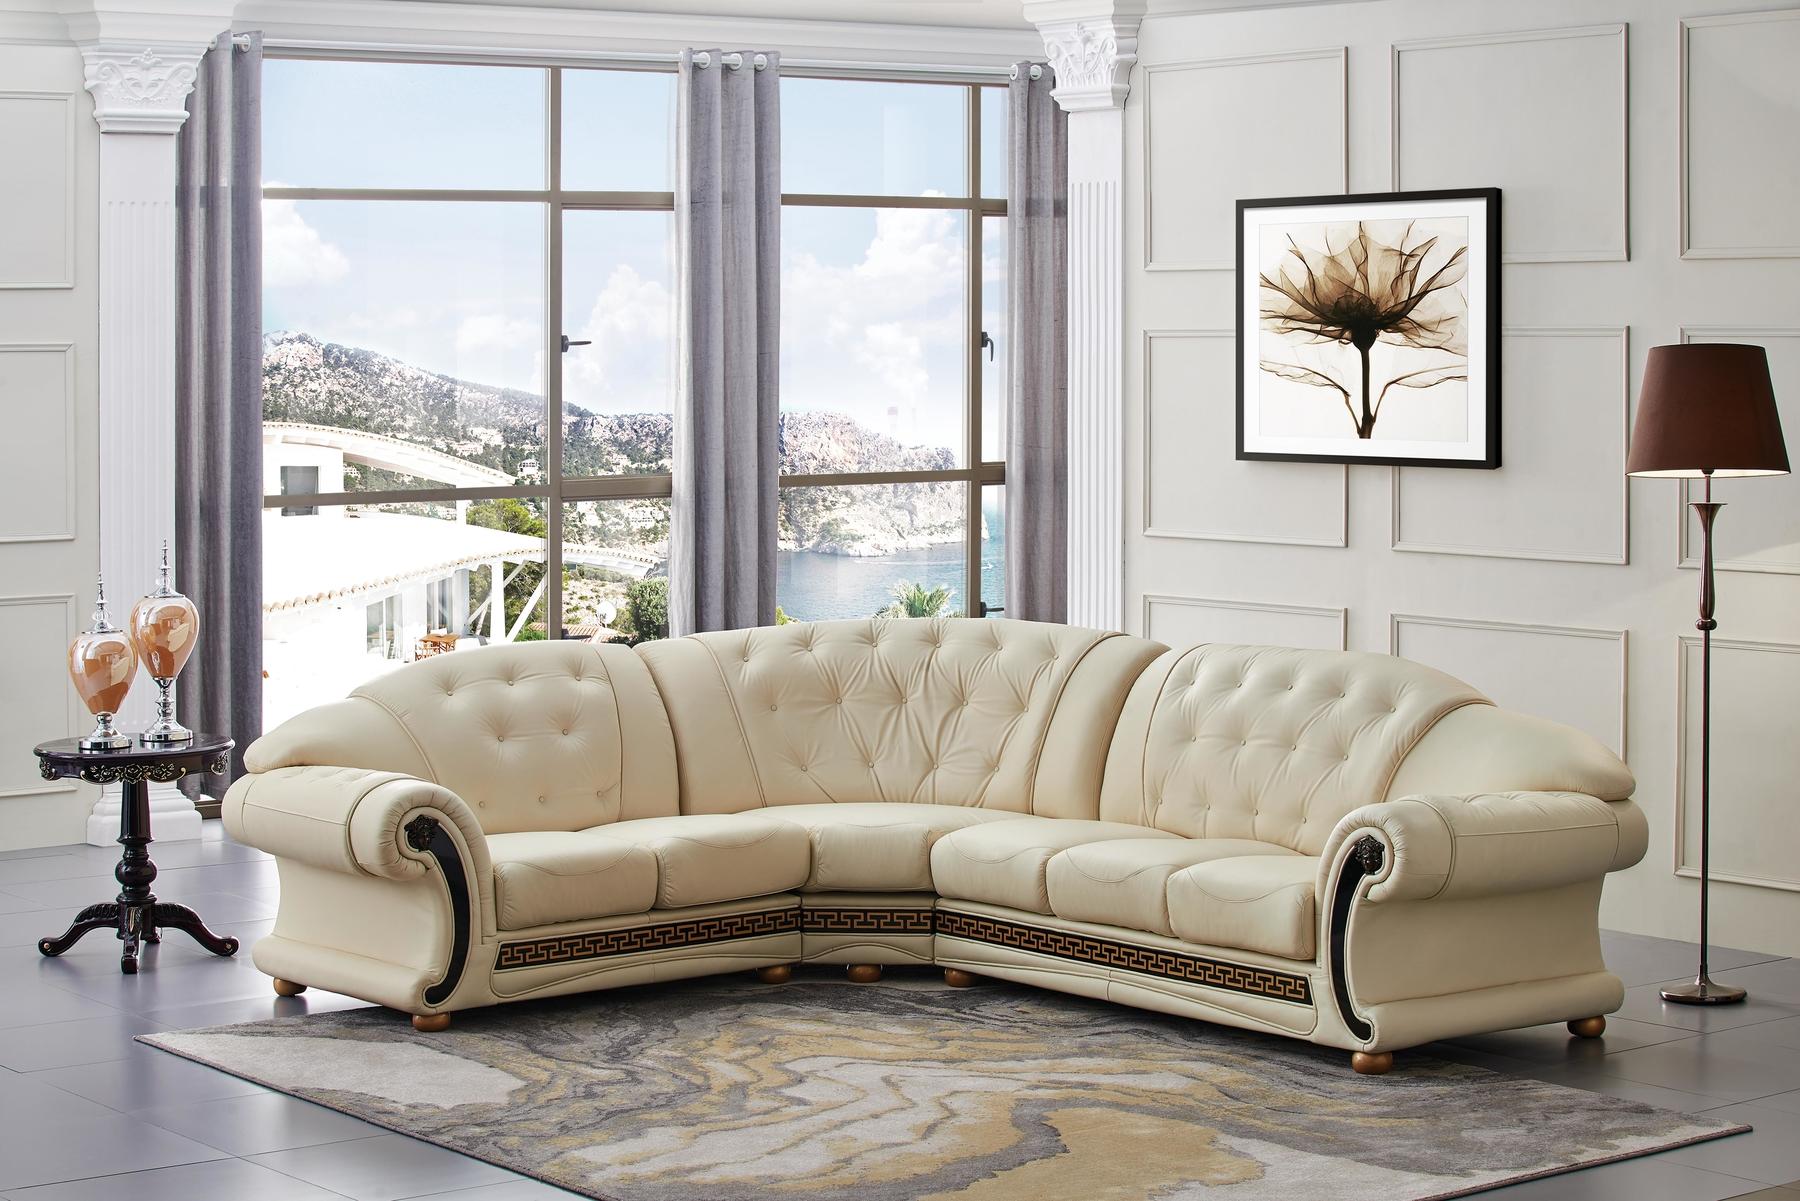 Phenomenal Versace Lf Ivory Sectional Sofa Creativecarmelina Interior Chair Design Creativecarmelinacom